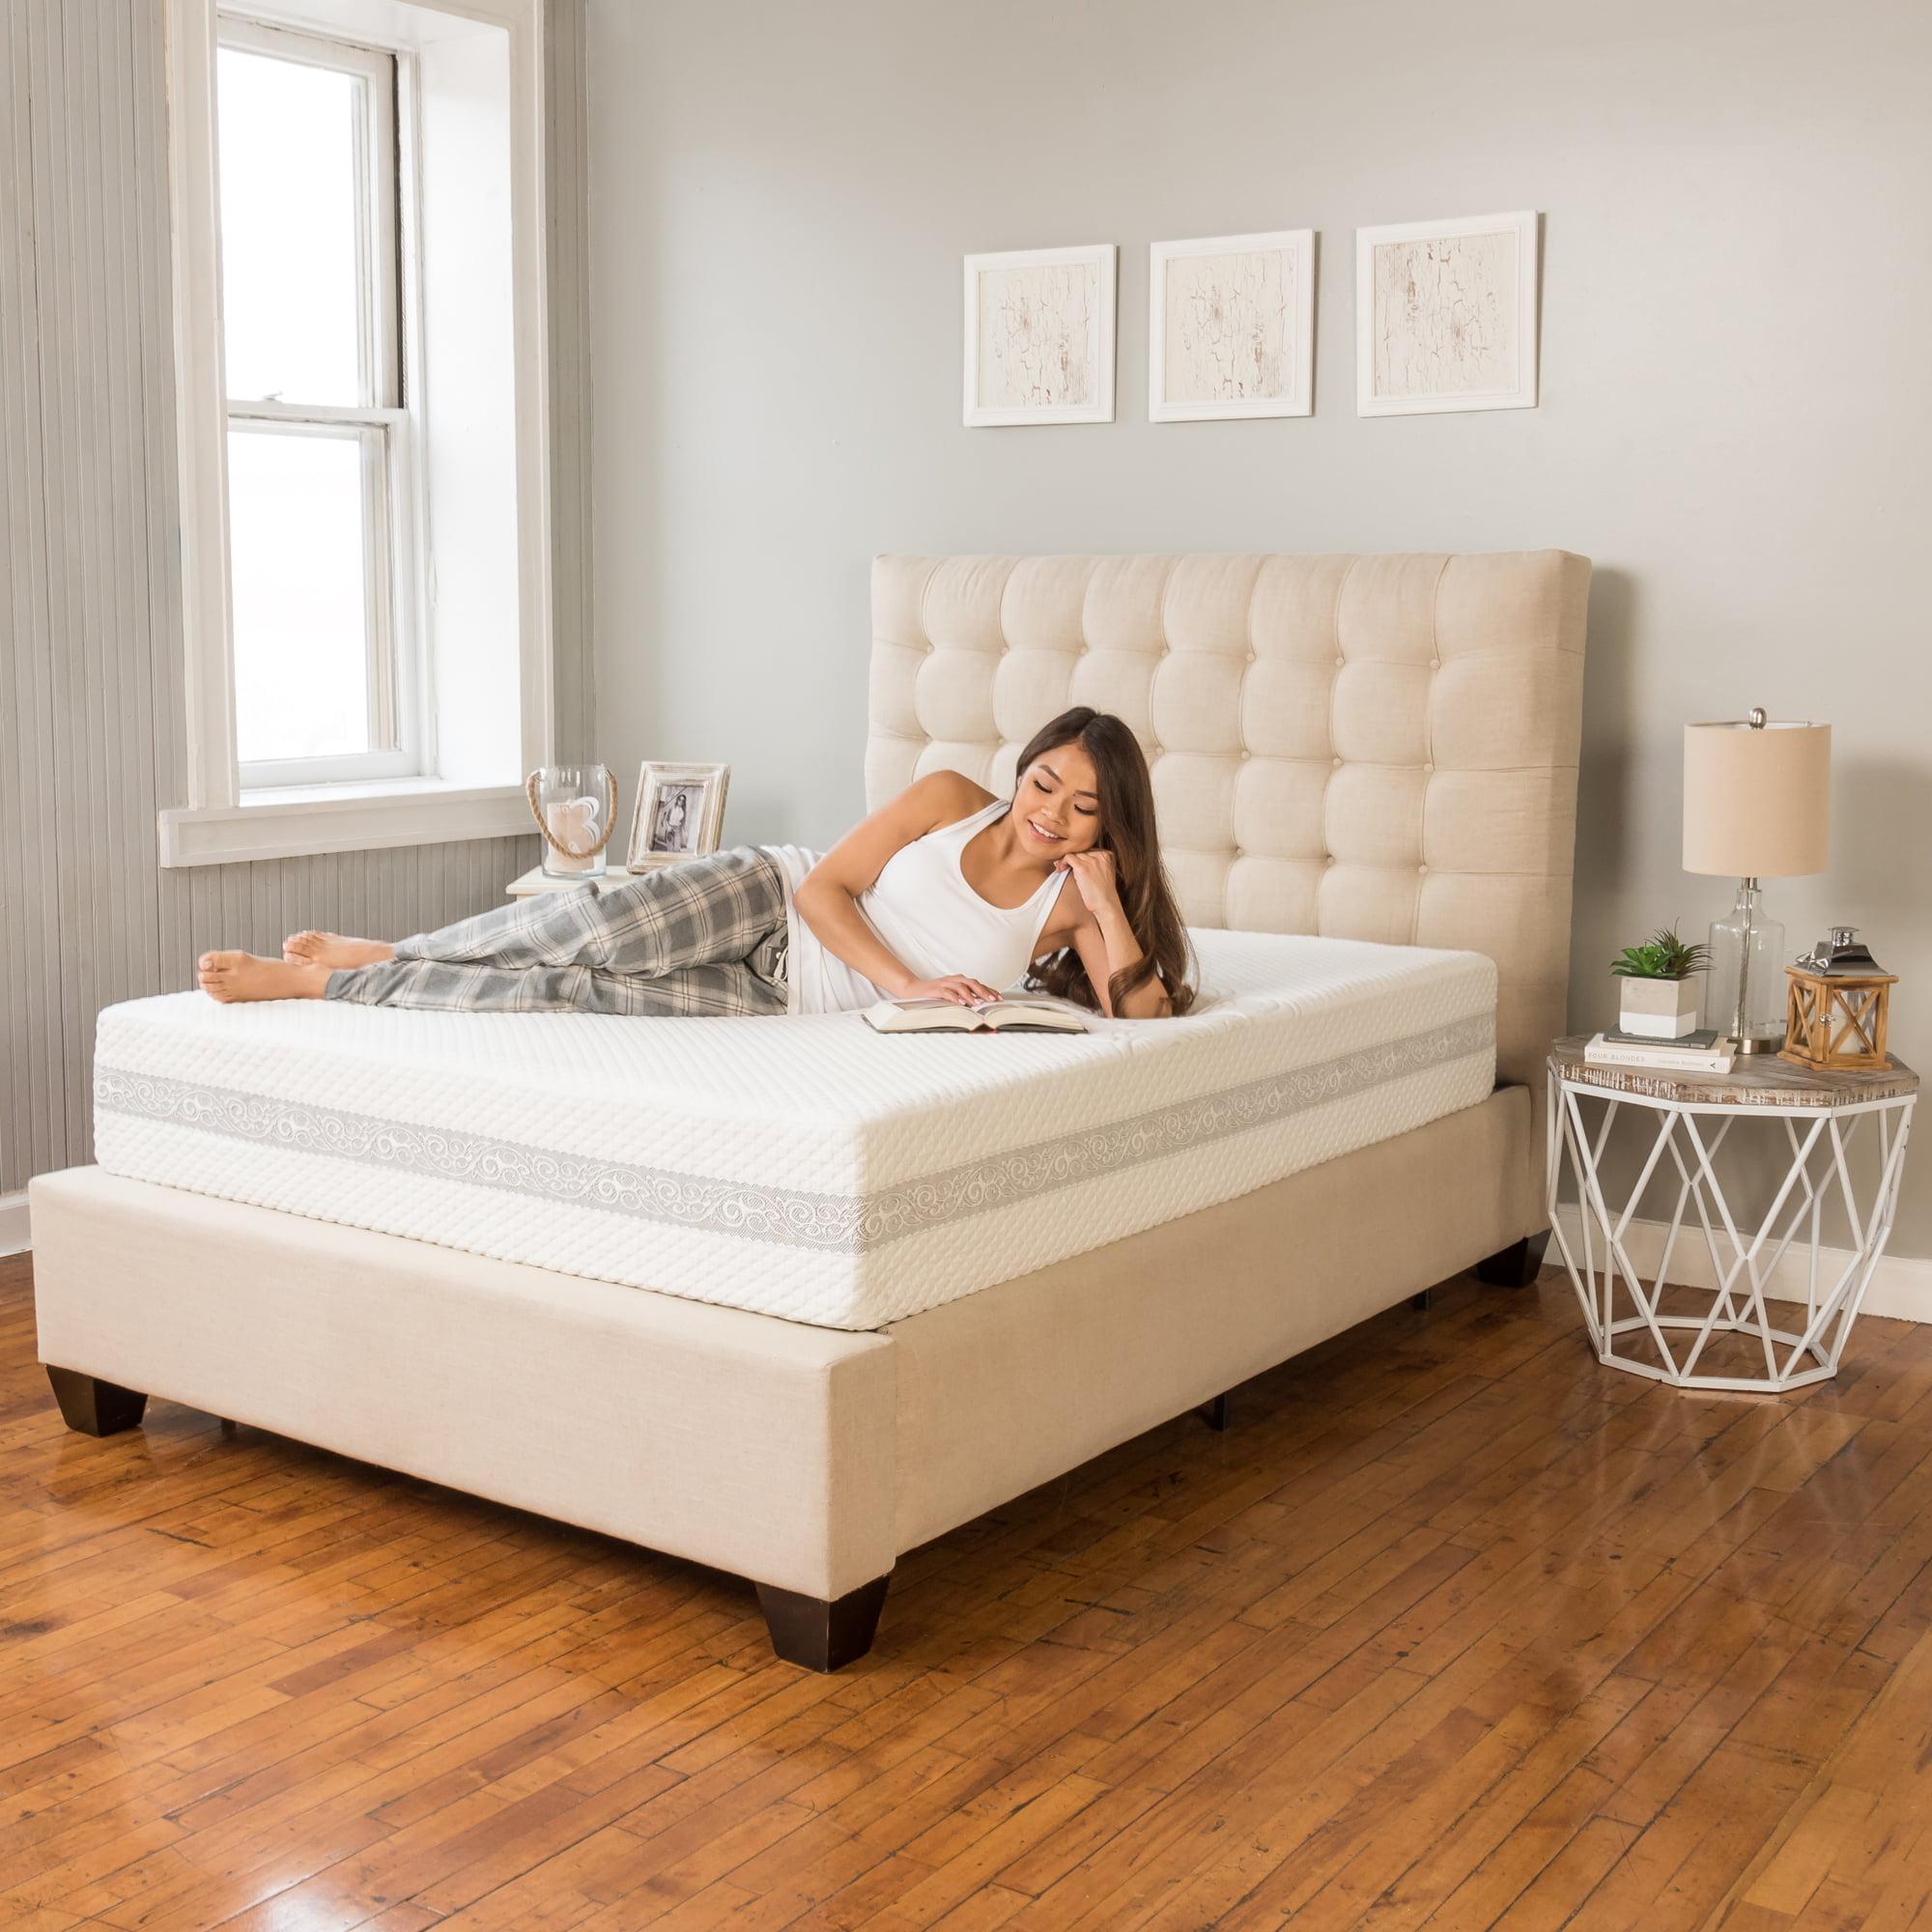 Modern Sleep Engage Gel Memory Foam and Innerspring Hybrid 11-Inch Mattress, Multiple... by Classic Brands